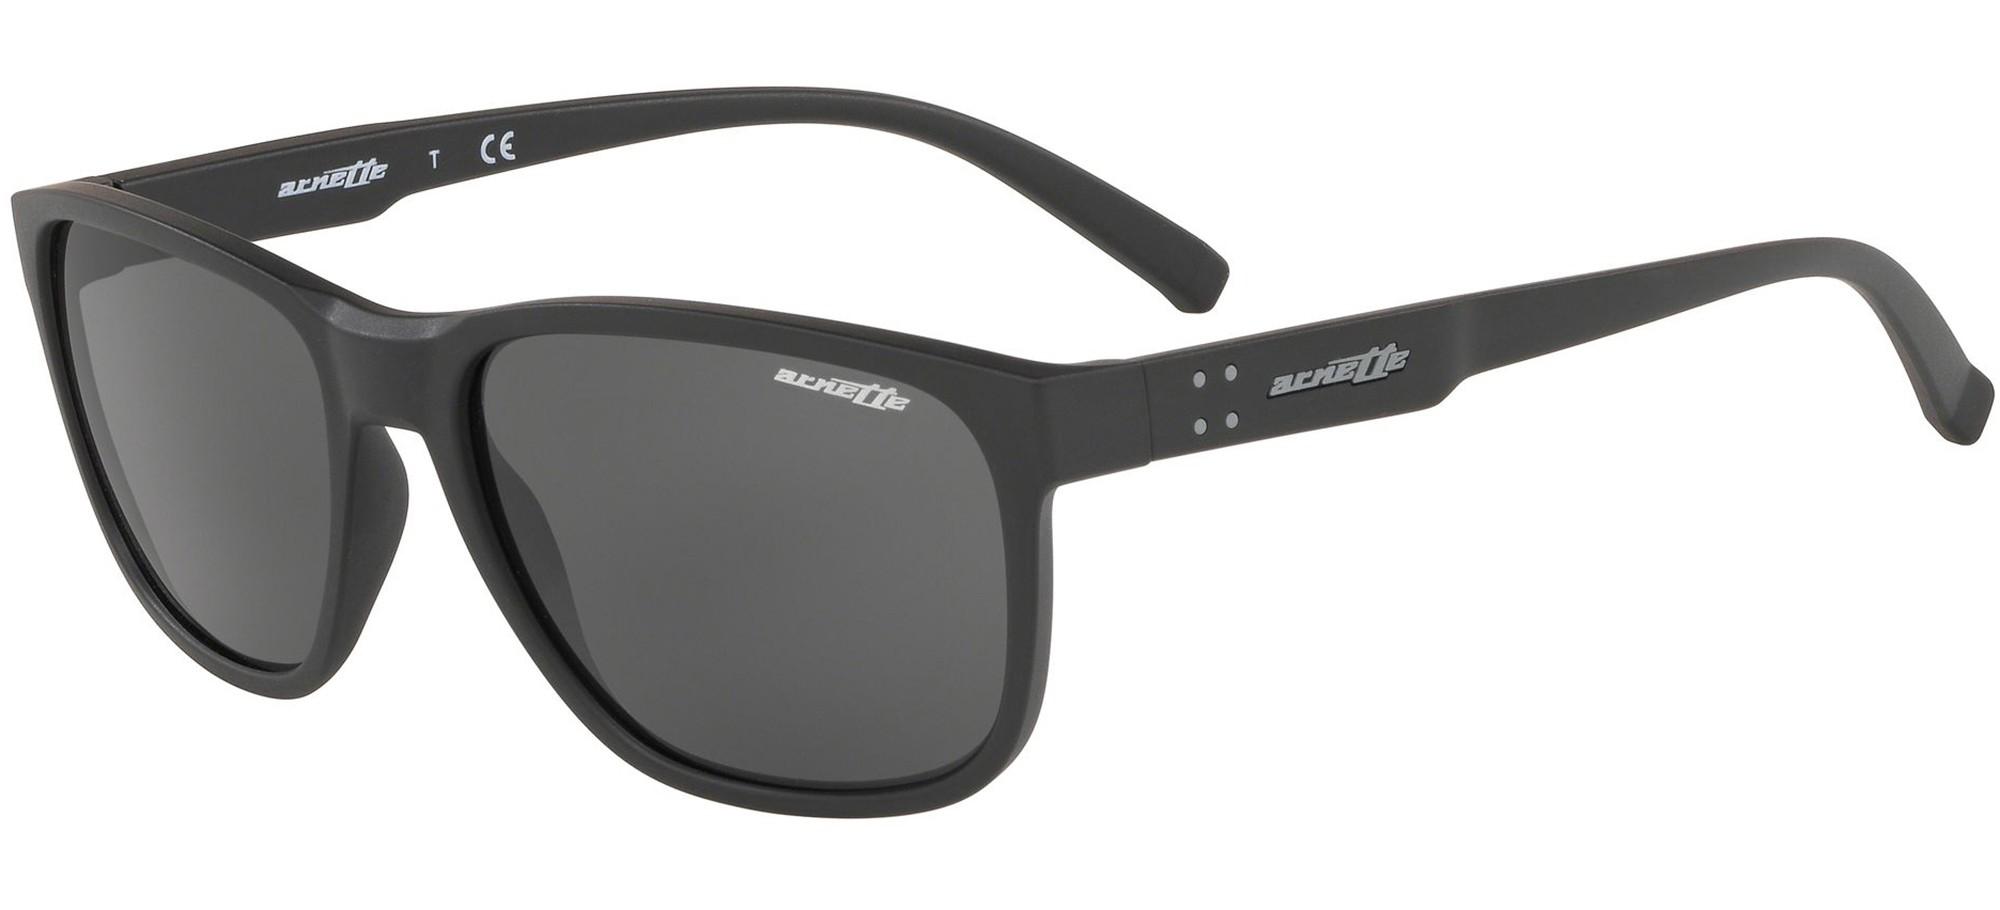 Arnette sunglasses URCA AN 4257